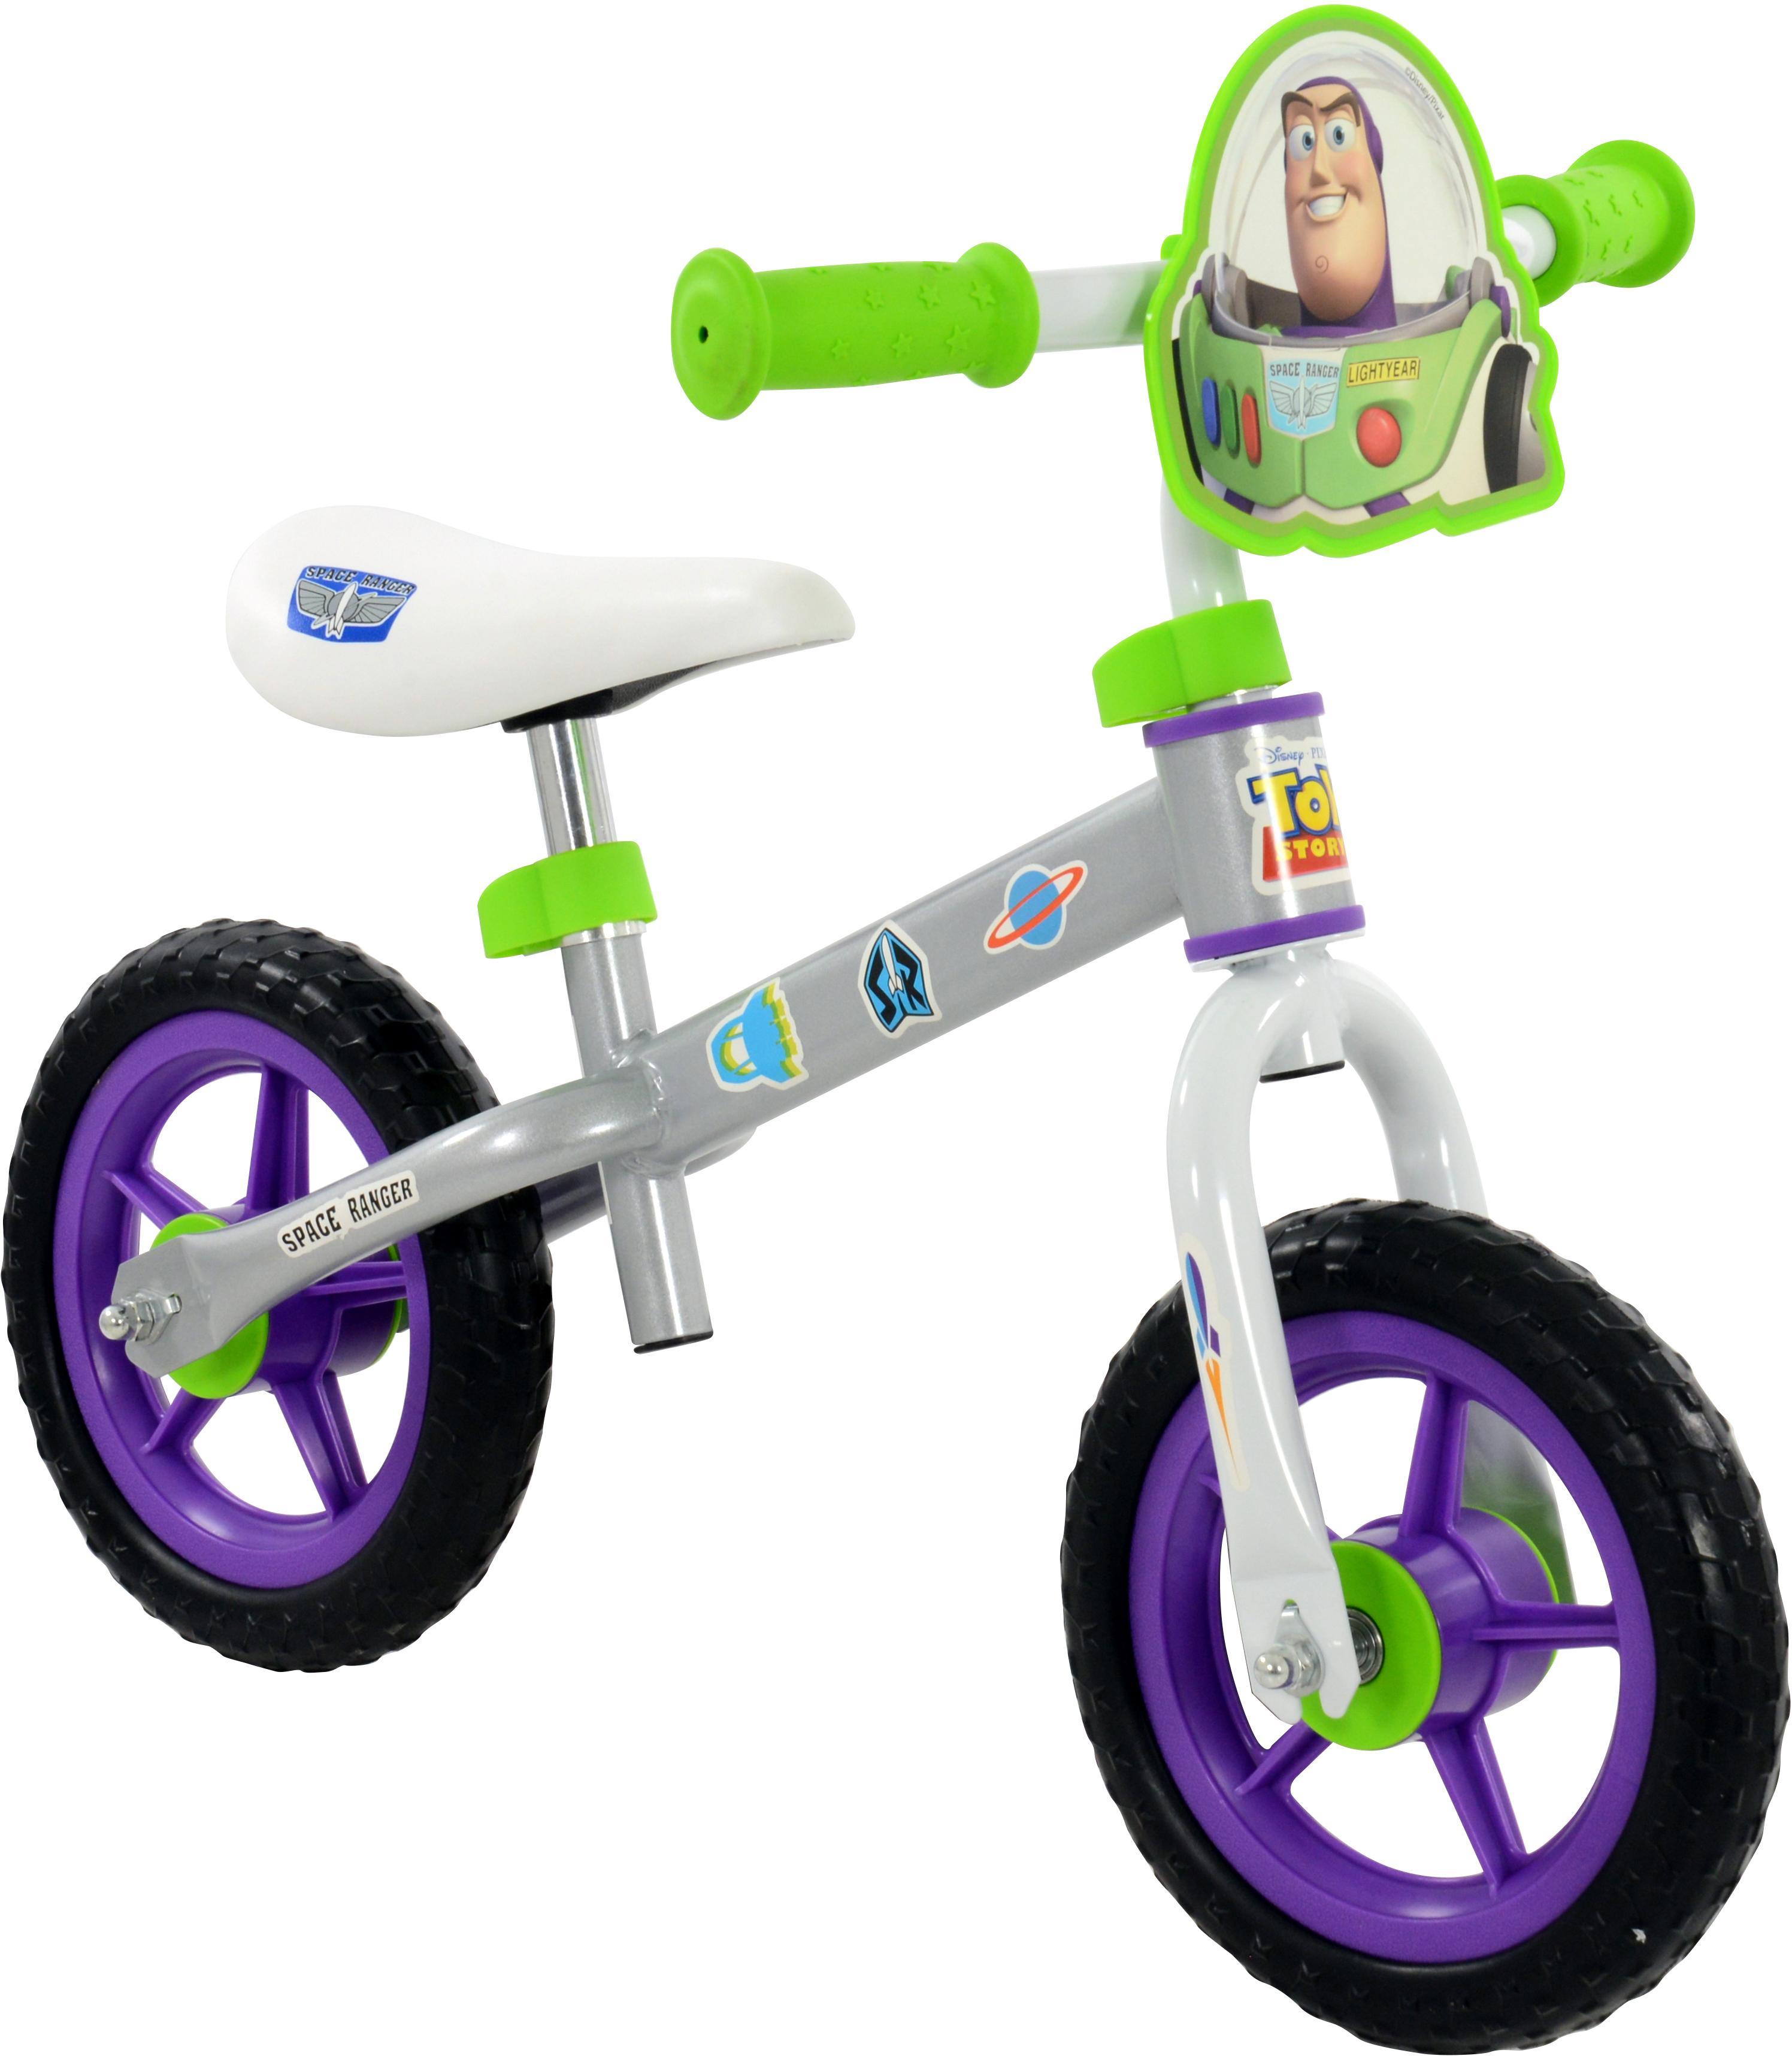 Buzz Lightyear Balance Bike   10 Inch Wheel